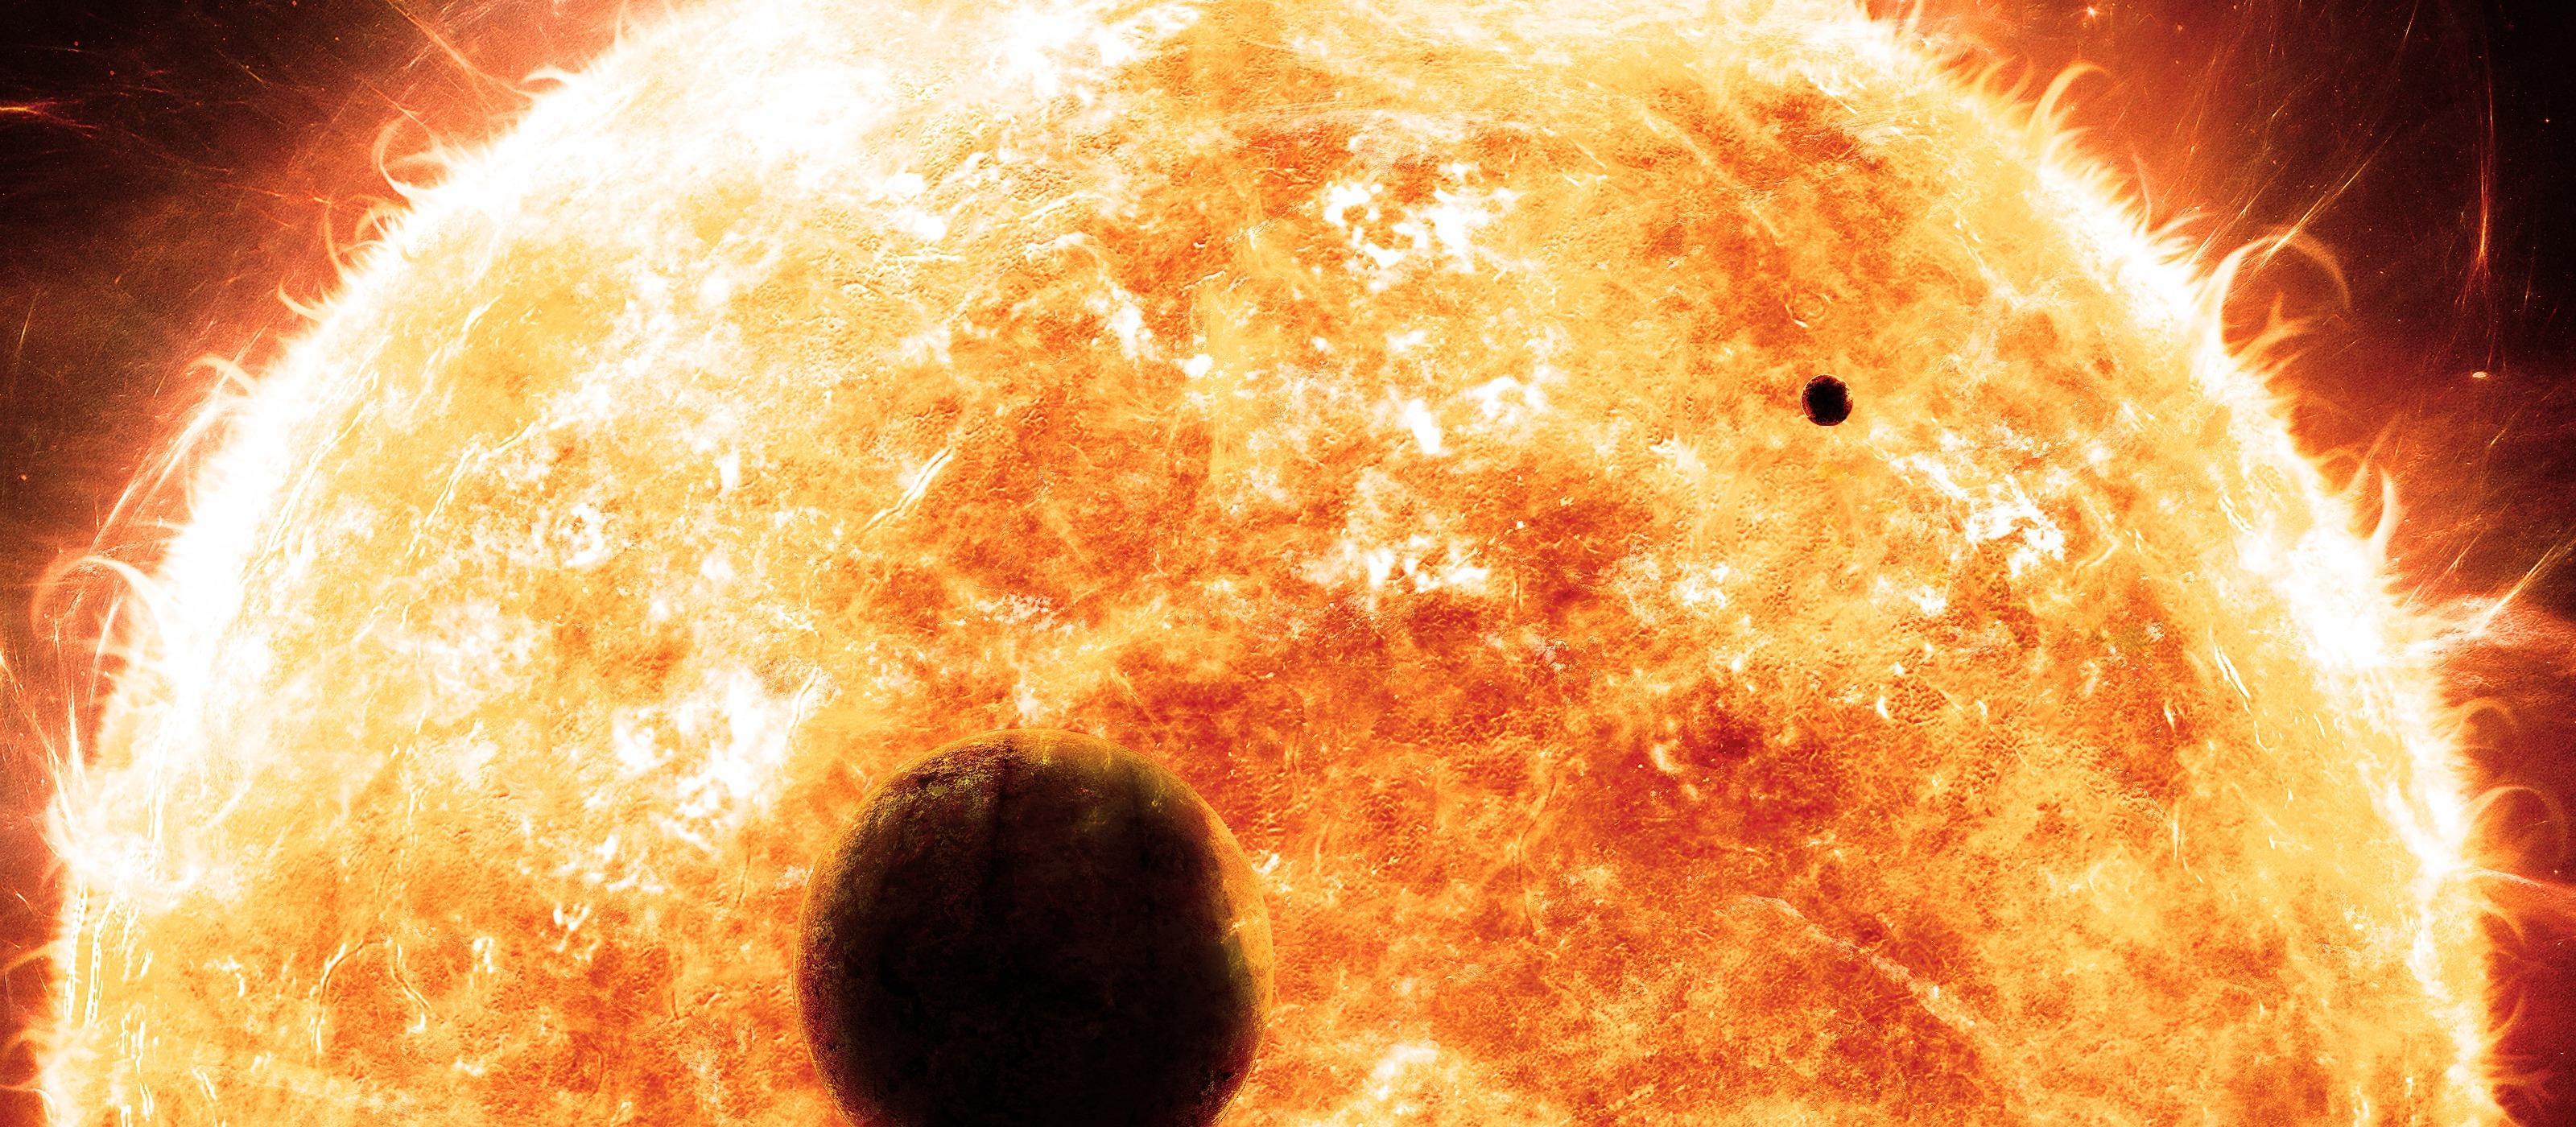 red giant sun - HD1920×1200